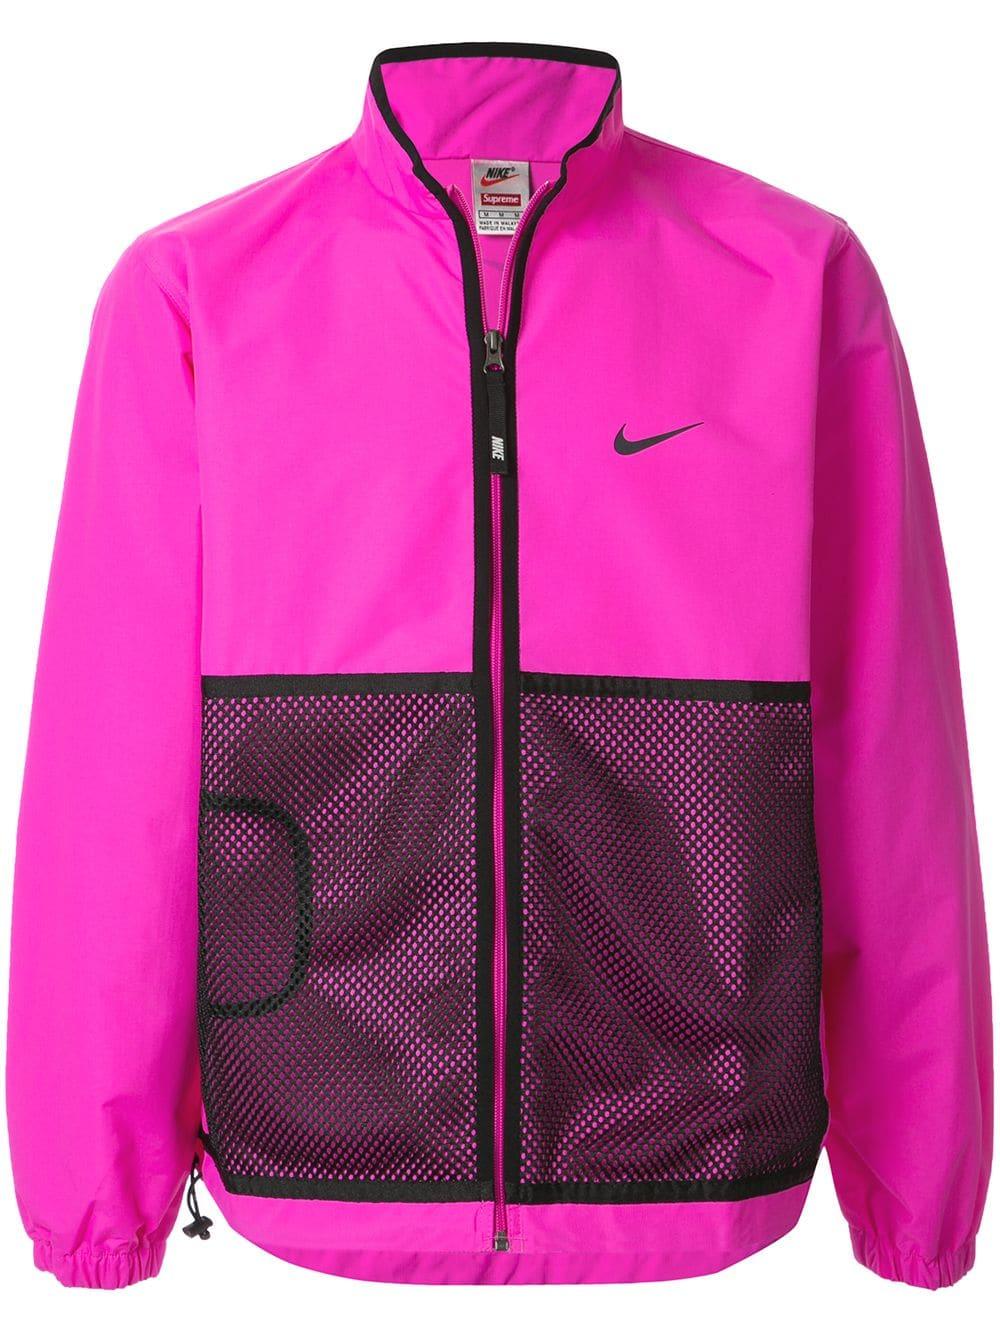 Nike Trail running jacket Running jacket, Jackets